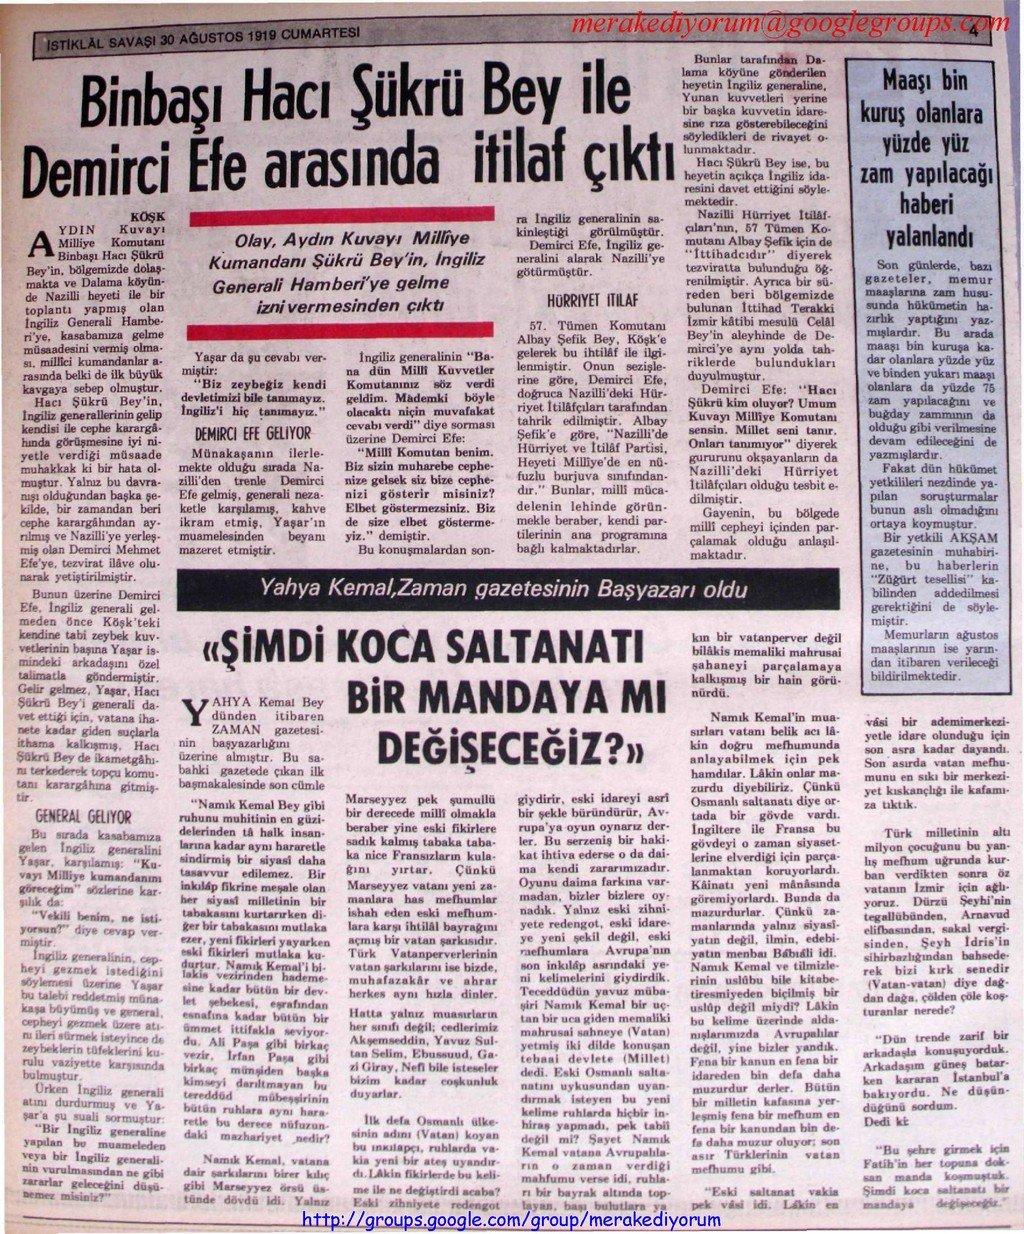 istiklal savaşı gazetesi - 30 ağustos 1919